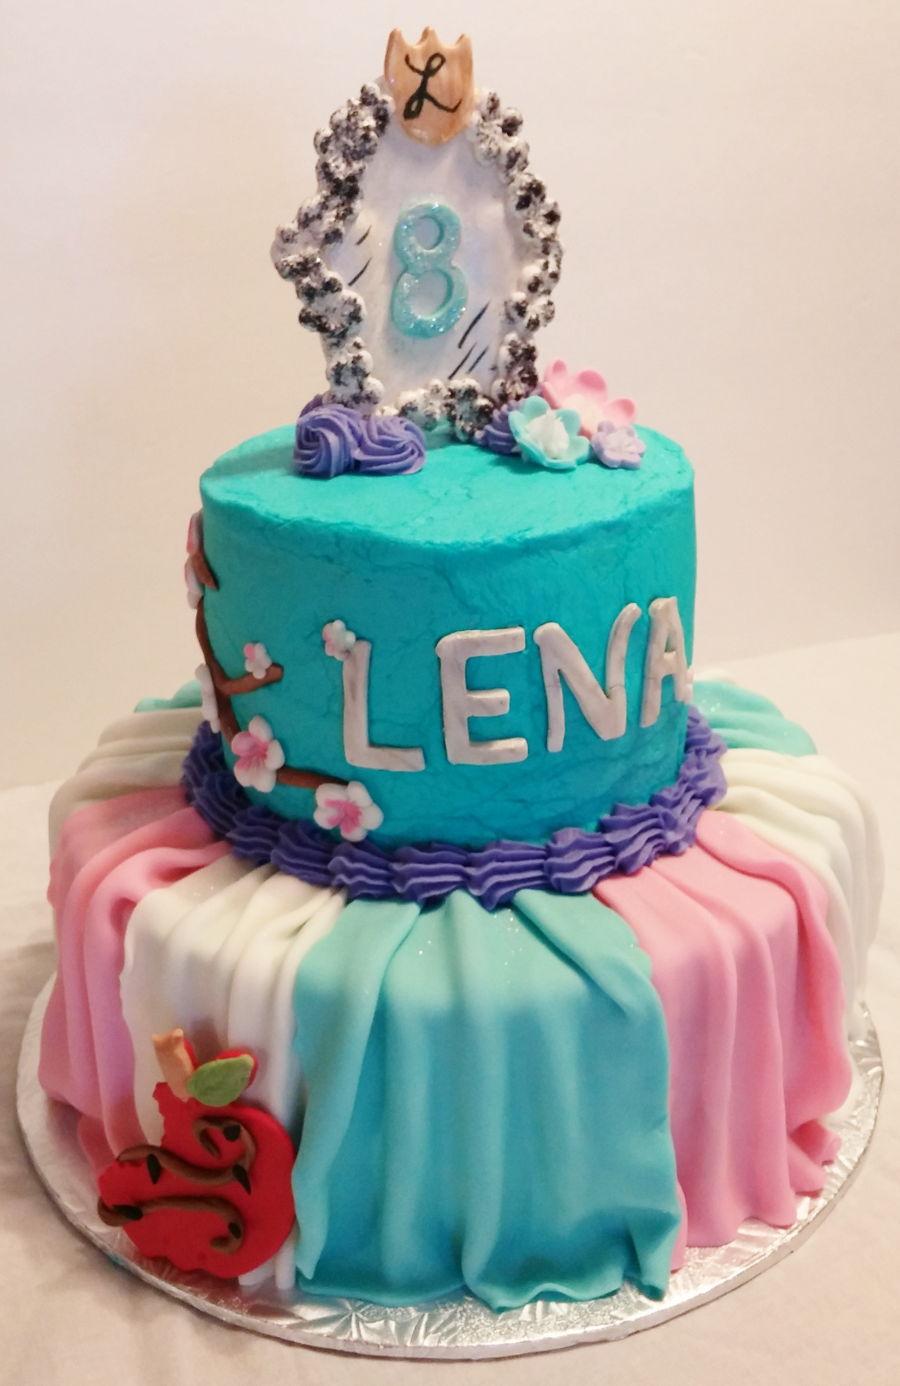 Disney Descendants Cake Images : Descendants Disney Theme Cake - CakeCentral.com